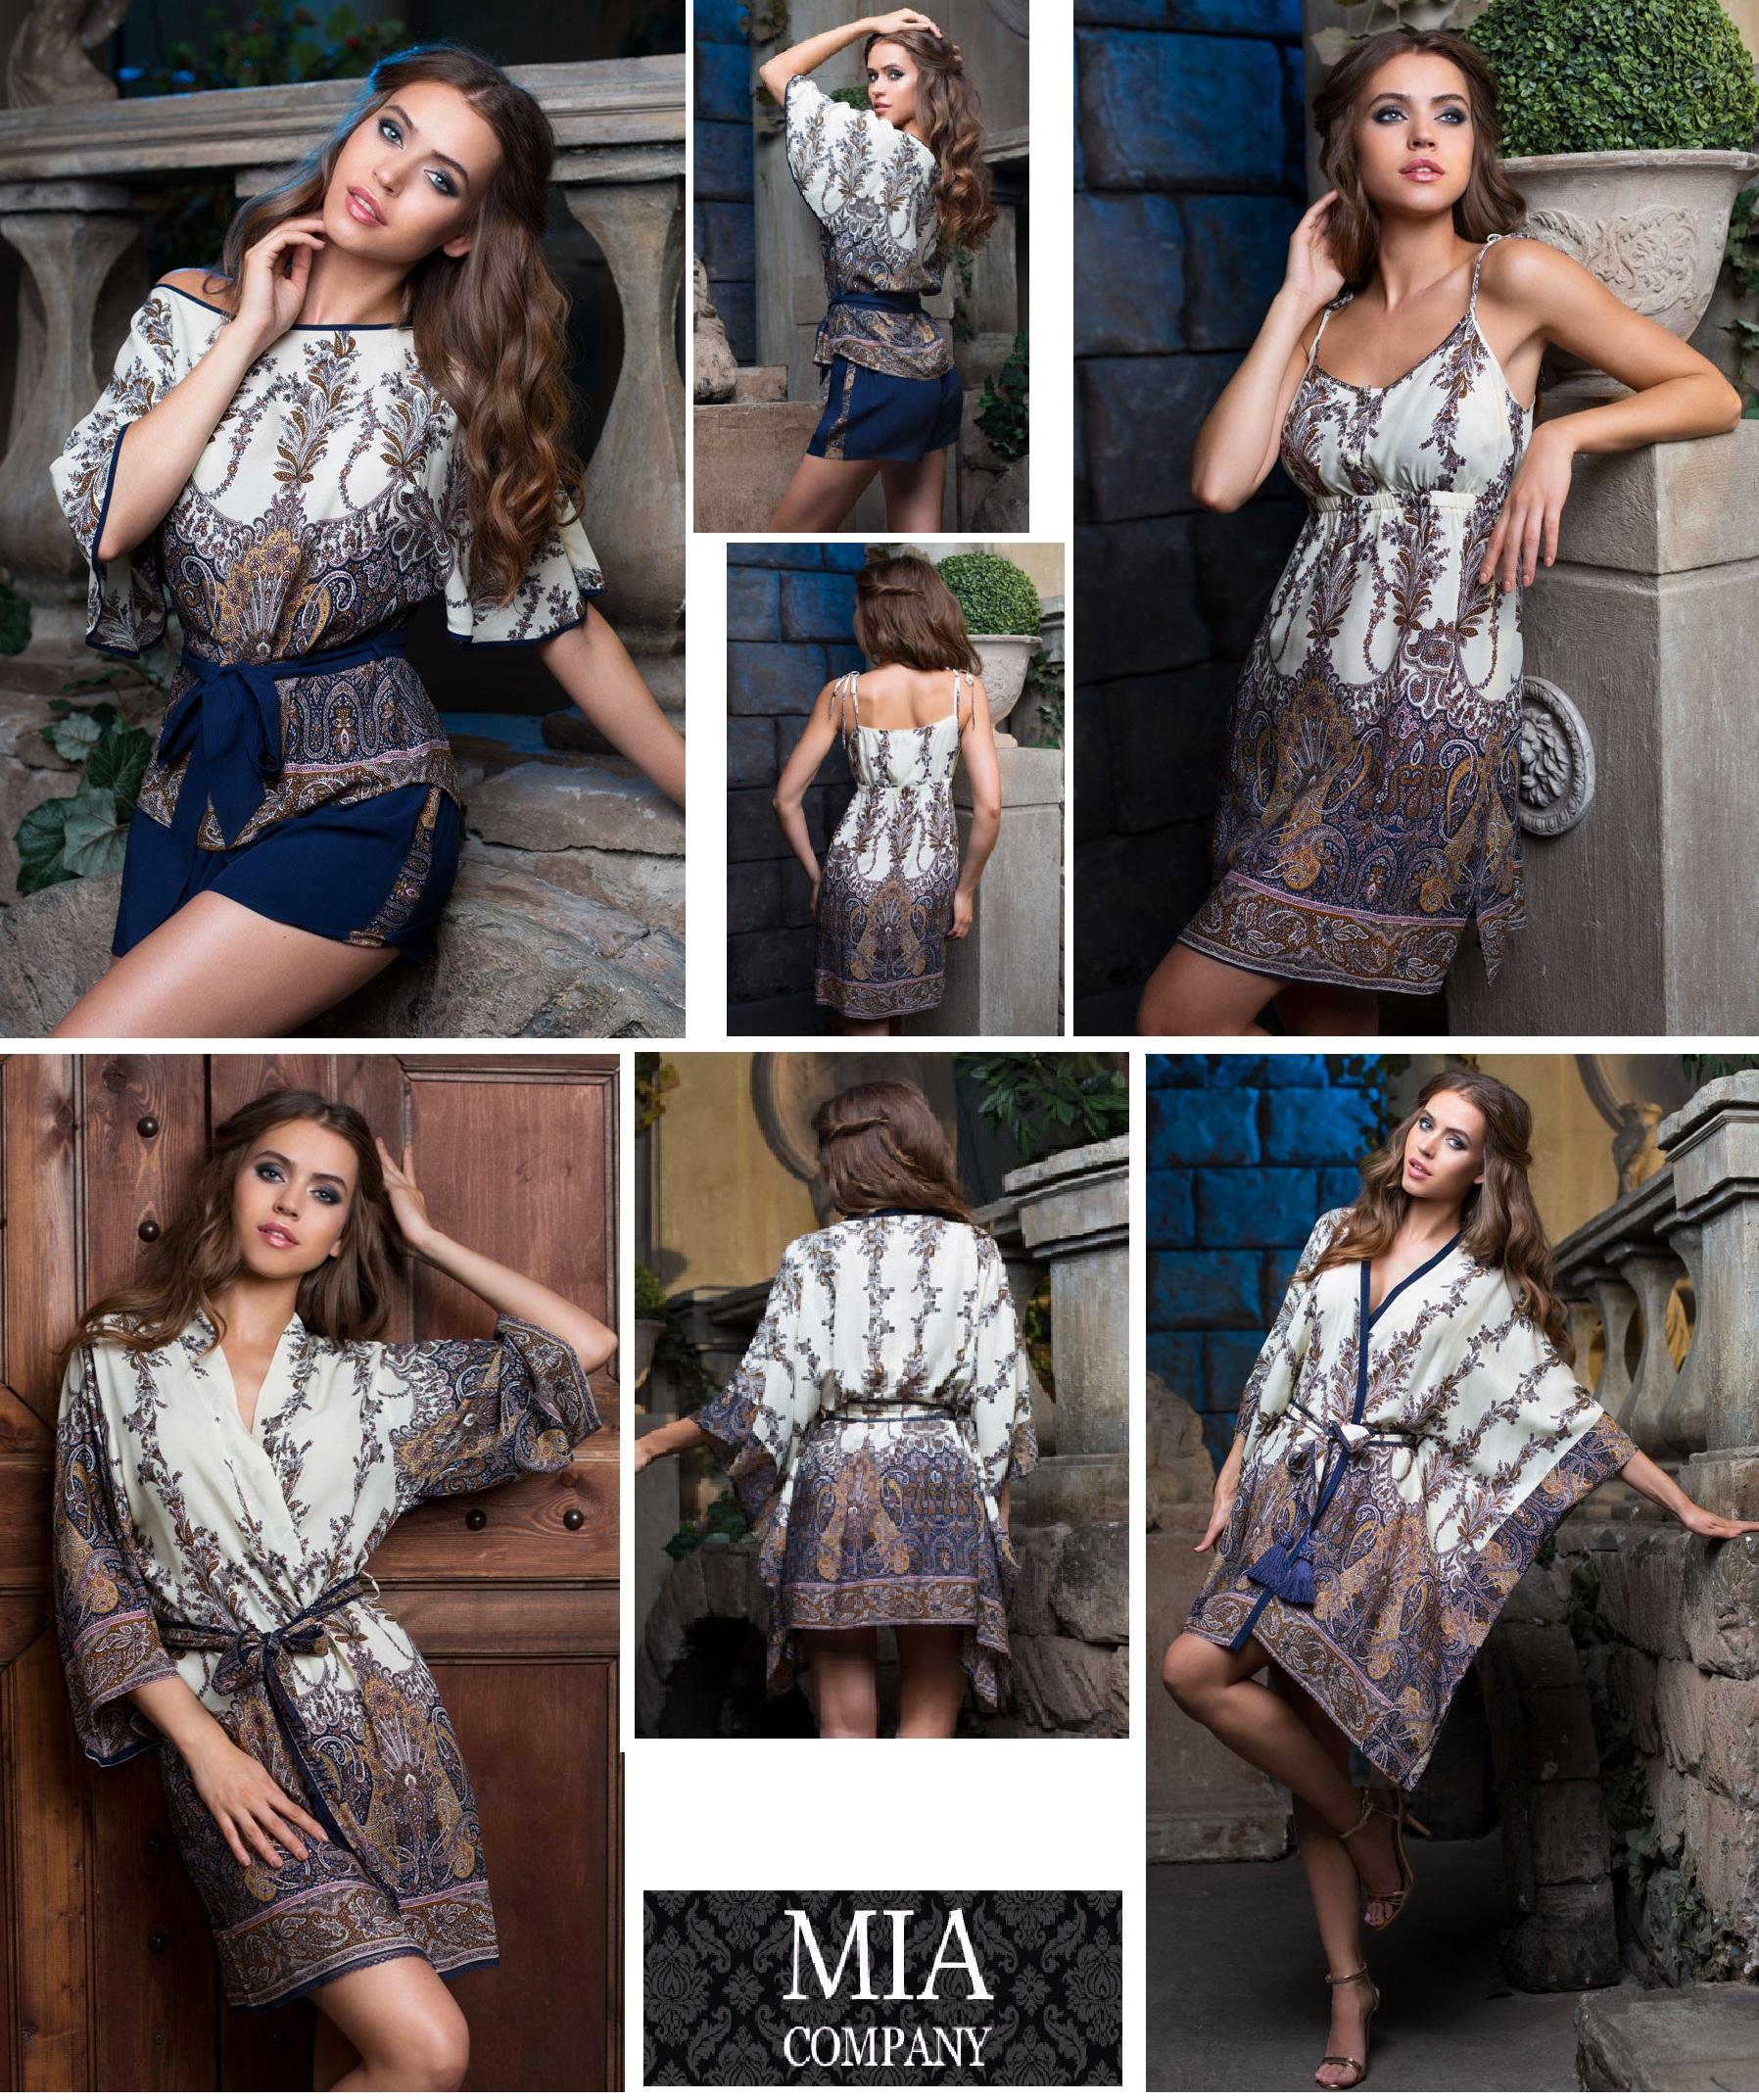 Женские сорочки, пижамы, халаты Mia-Mia Shakira купить интернет-магазин